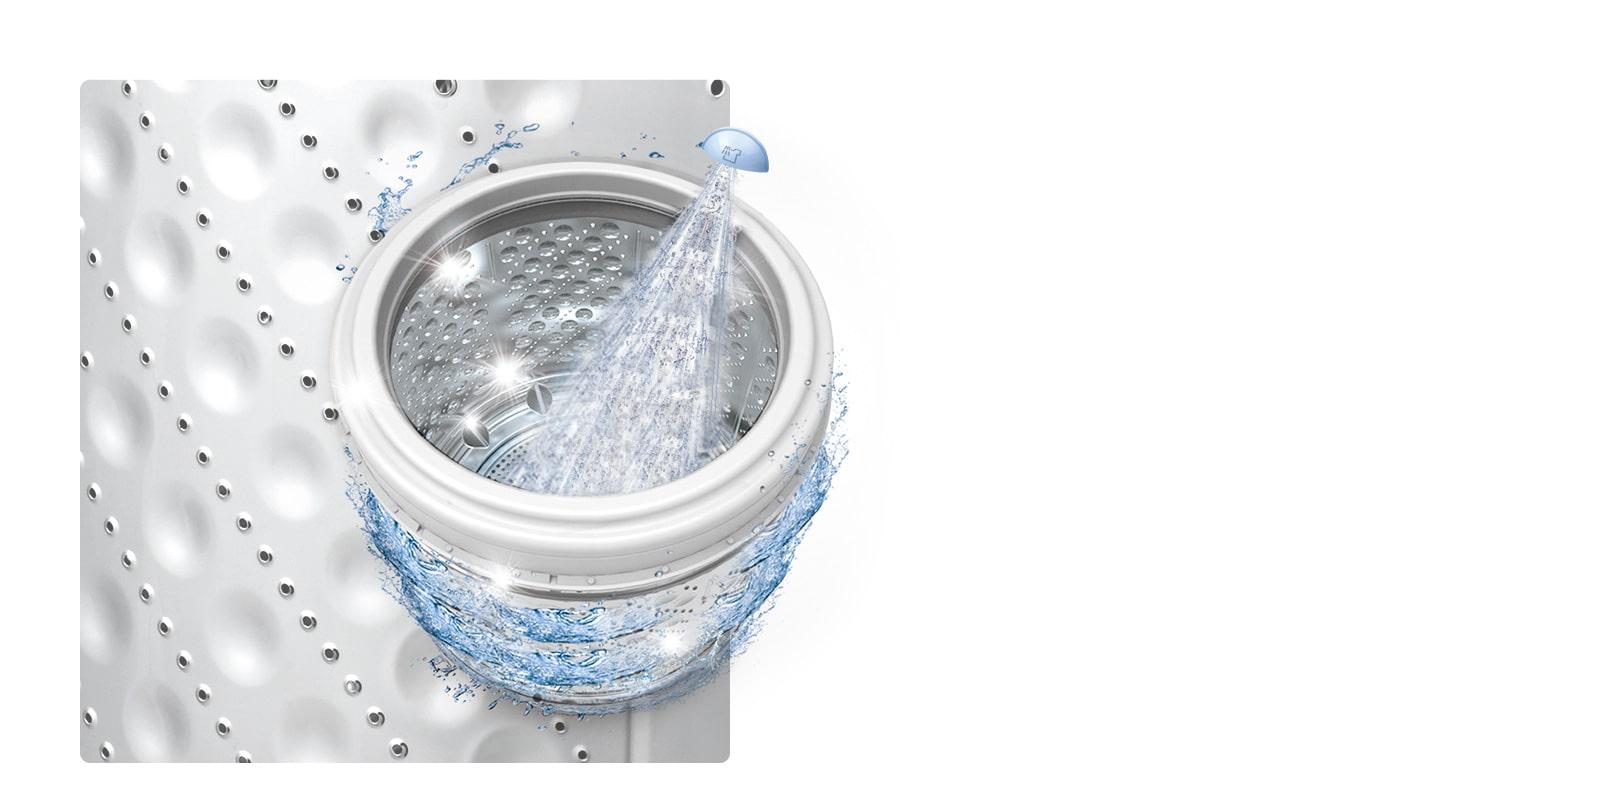 LG Auto Tub Clean